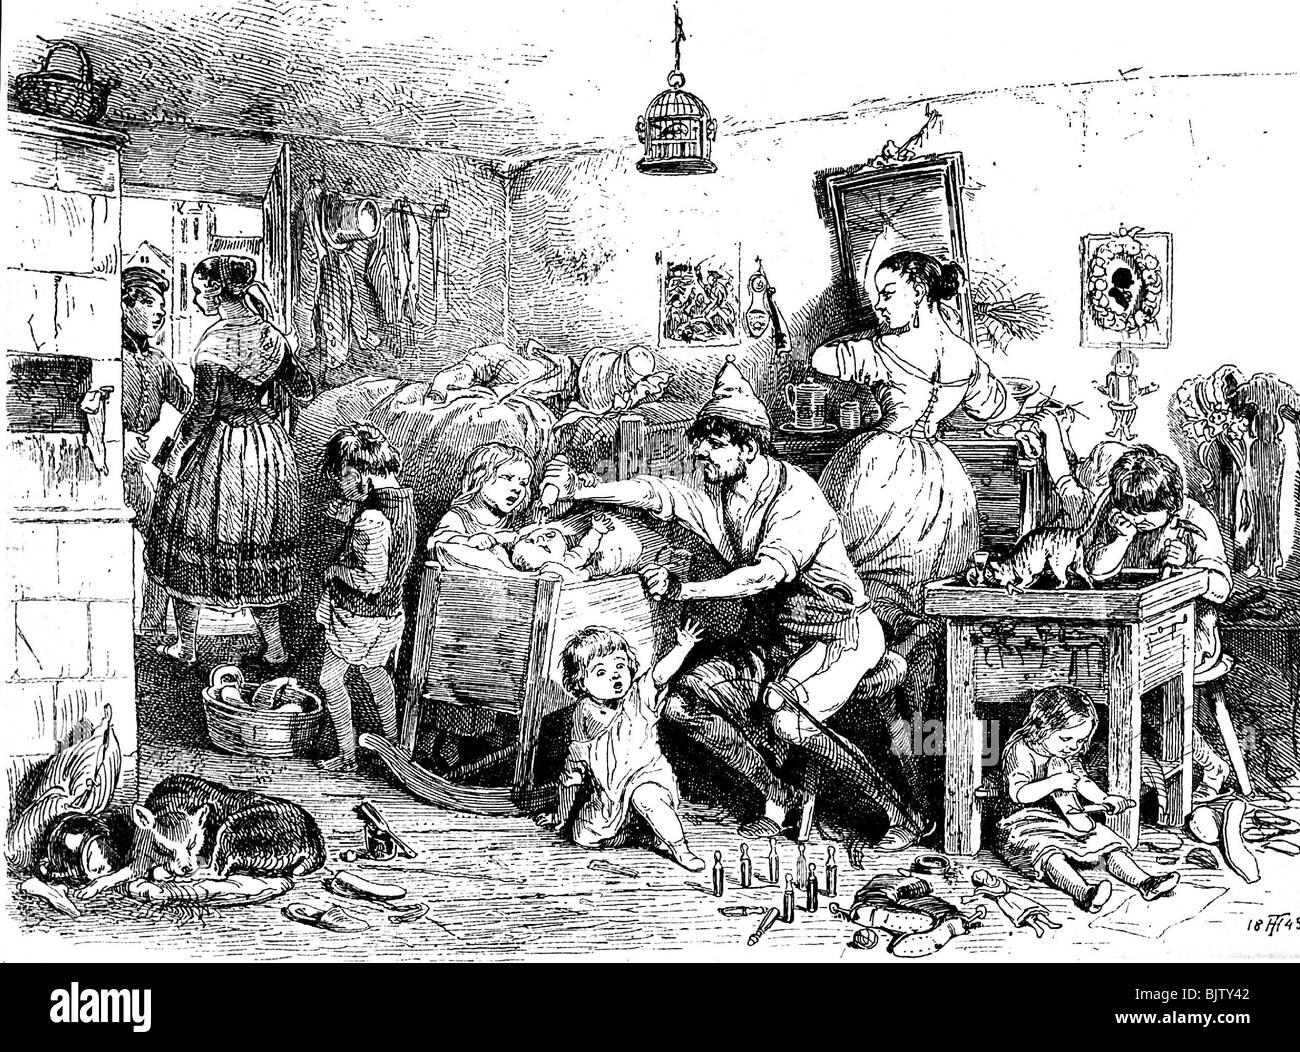 People Misery Adversity Poor Housing 19th Century